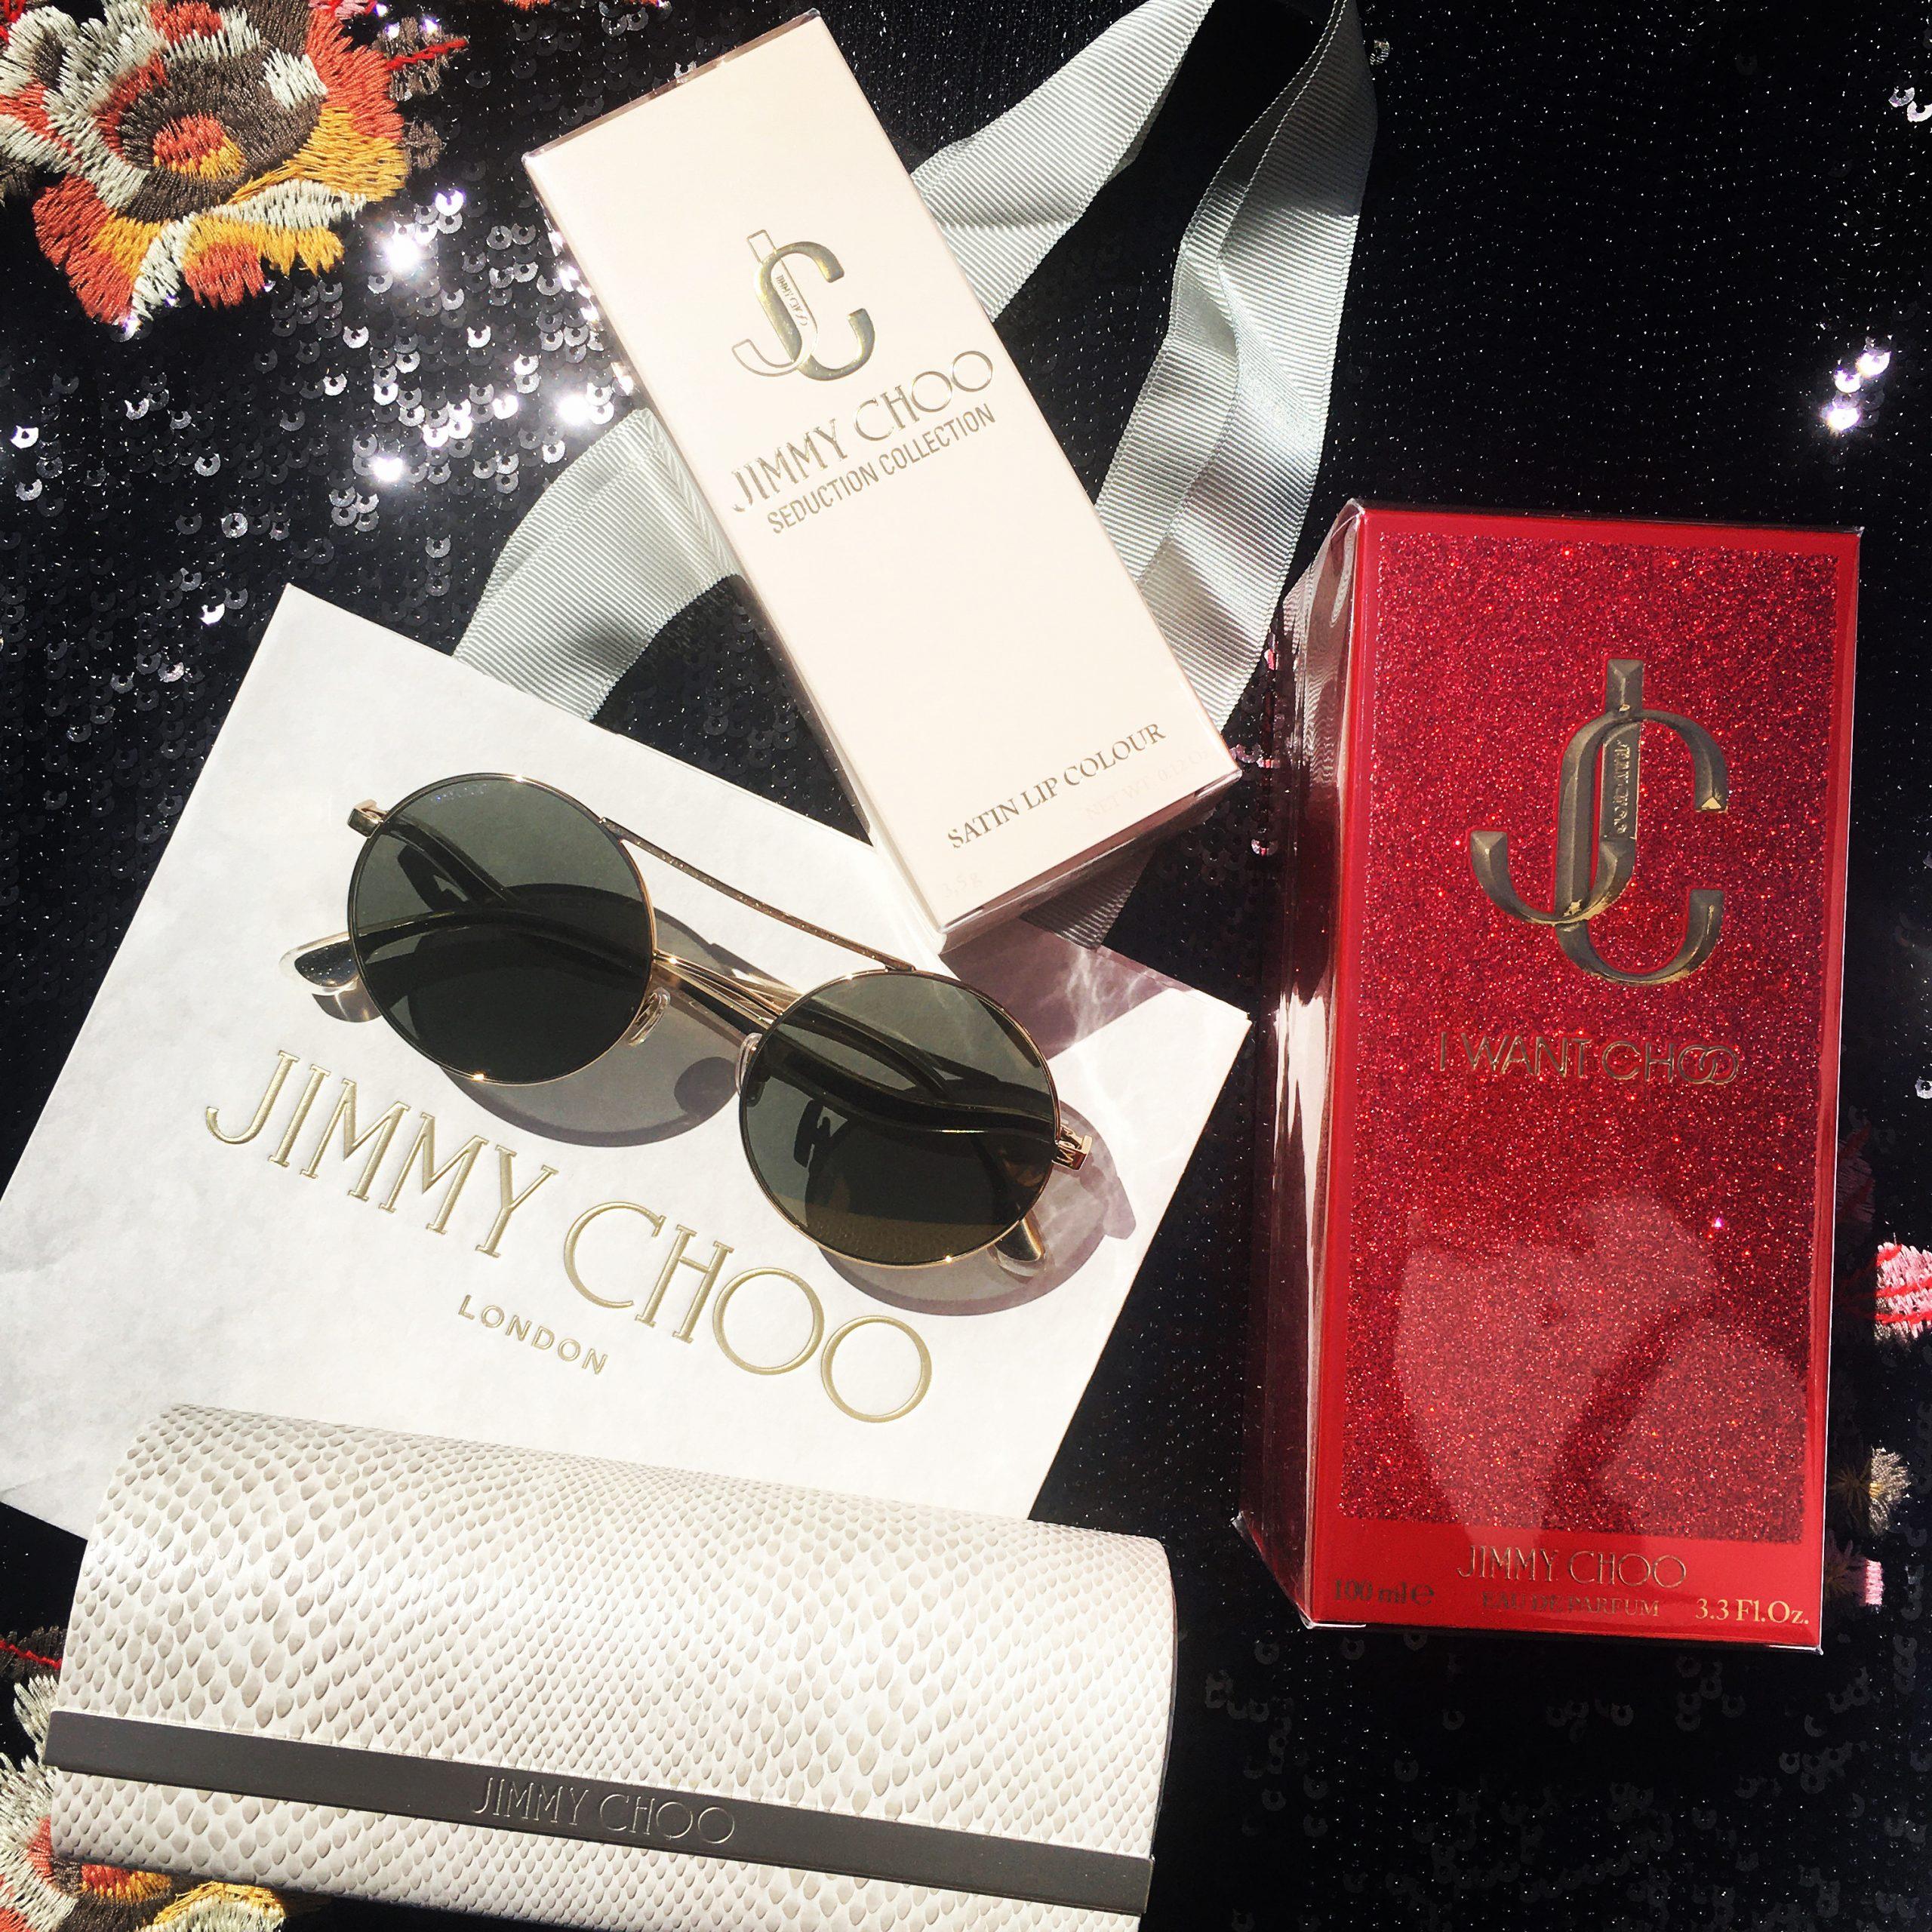 Win a Jimmy Choo fragrance, sunglasses and lipstick hamper 2